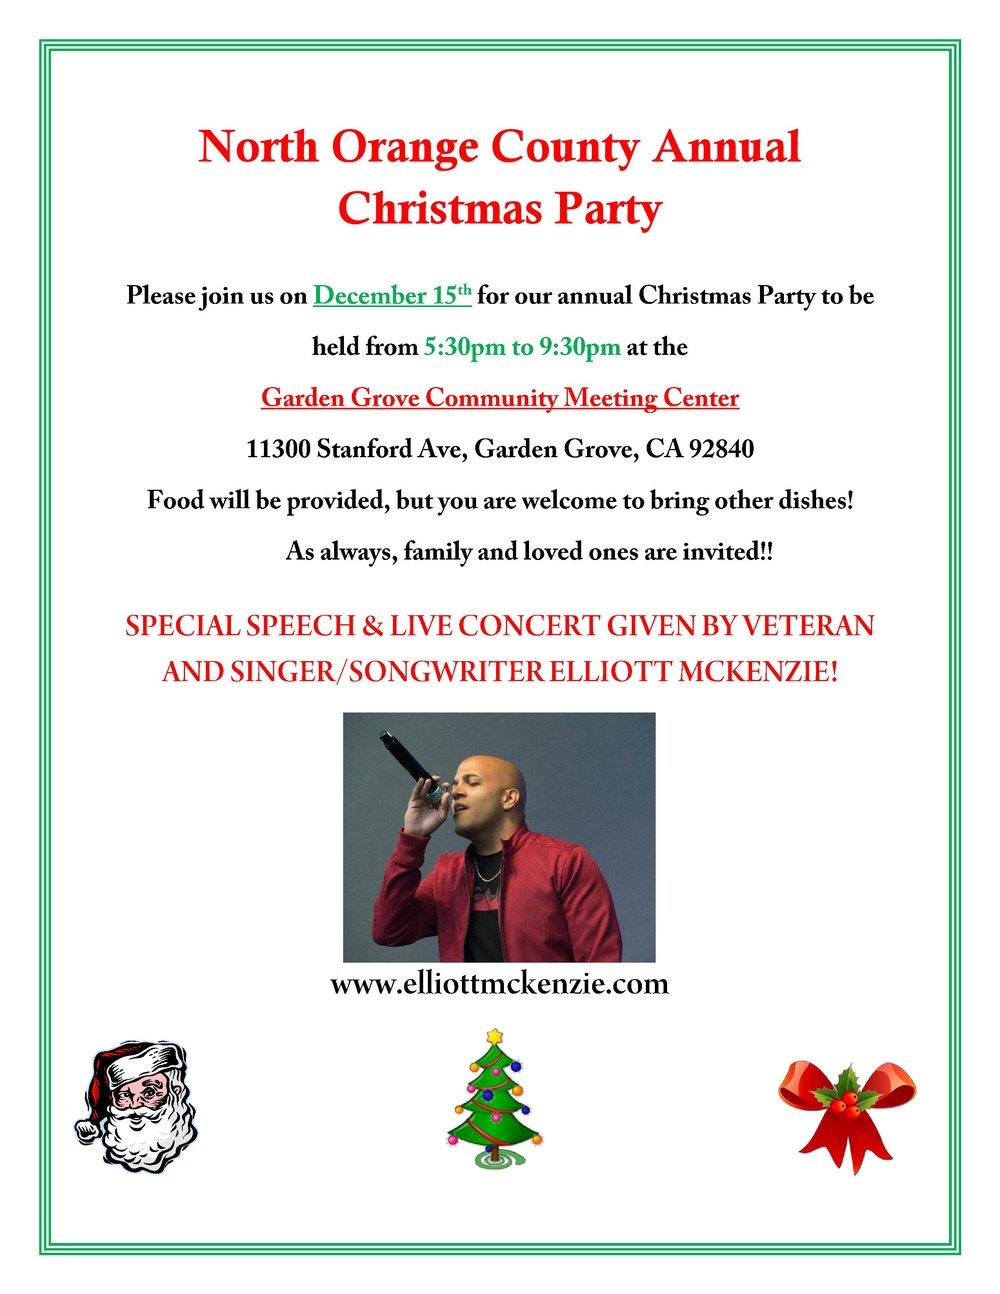 VET Center Christmas Flyer Featuring Elliott McKenzie-page-001.jpg